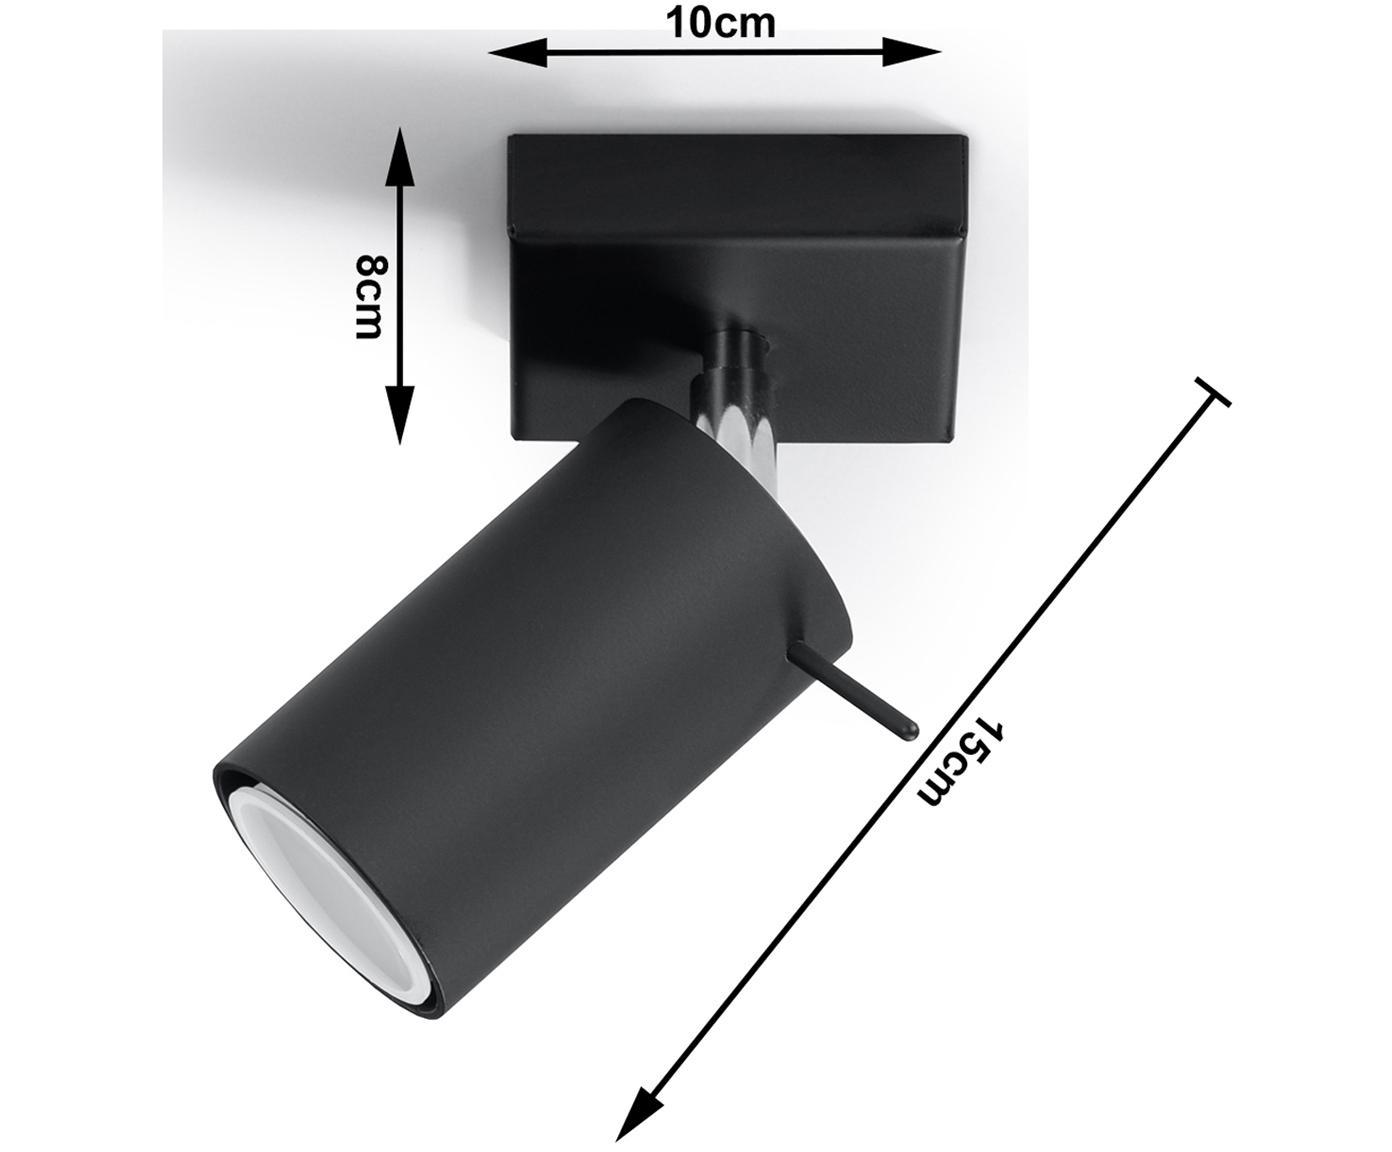 Applique en métal noir Etna, Noir